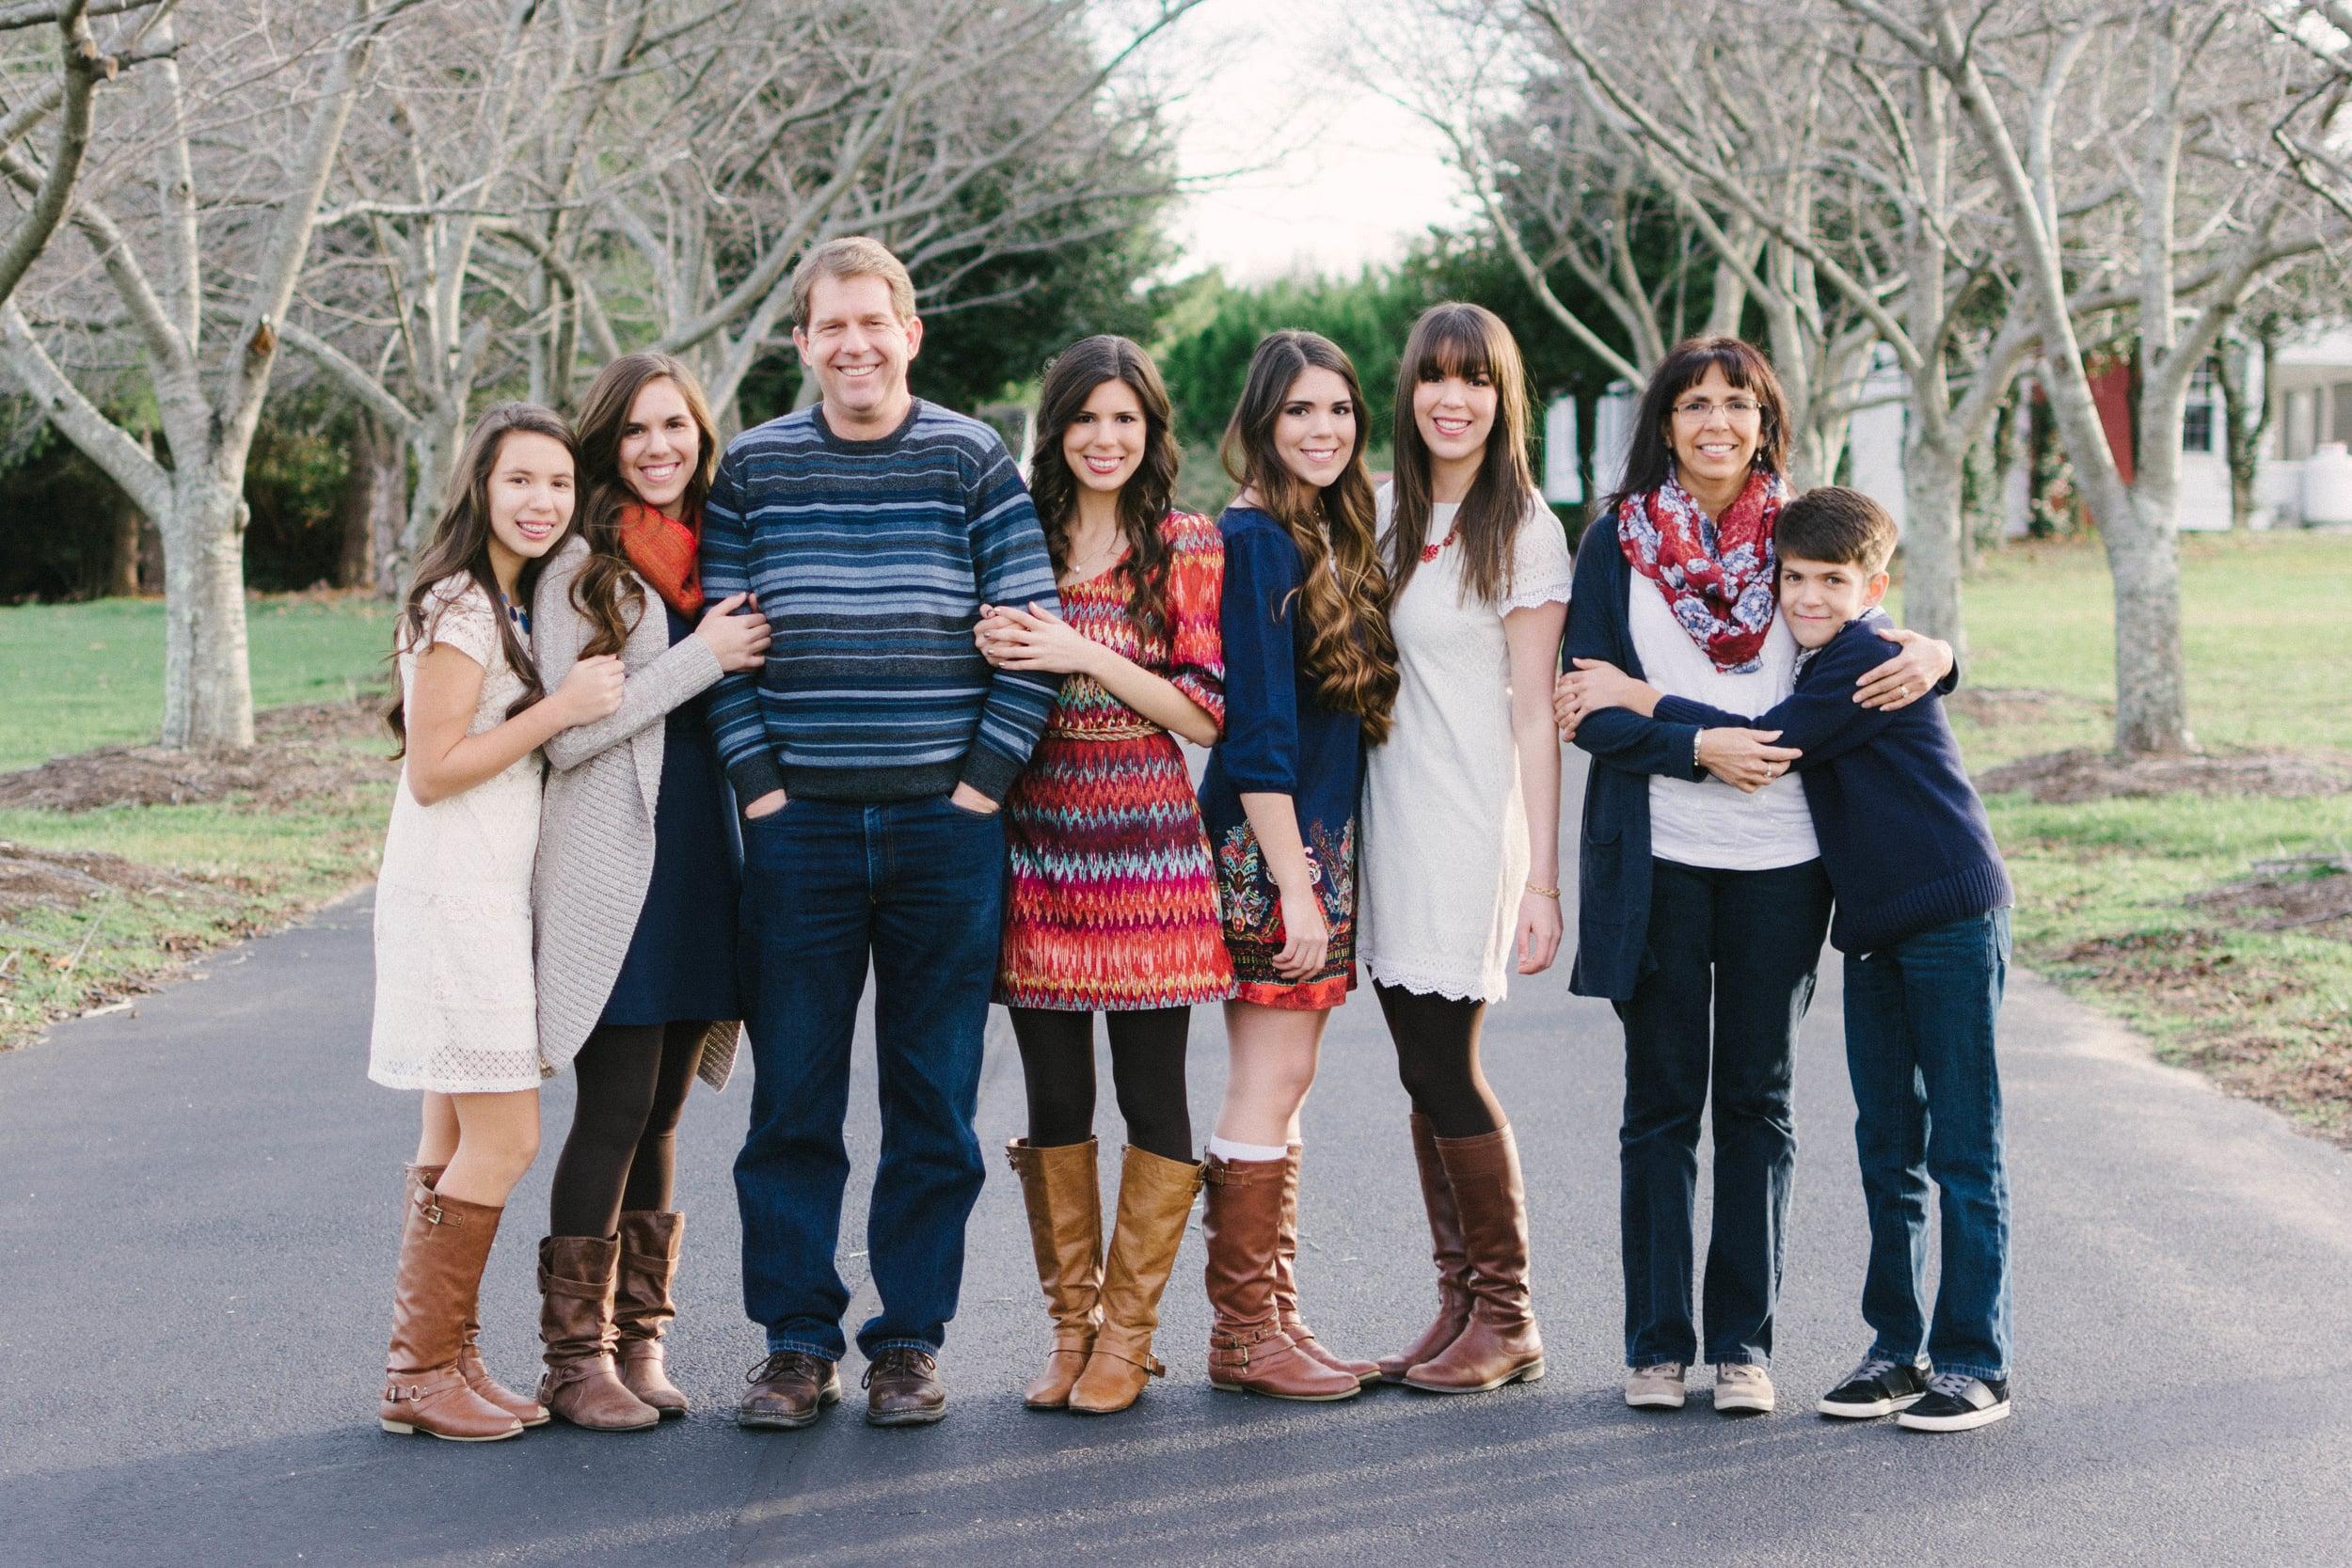 PEISSNERfamilyportraits-23.jpg